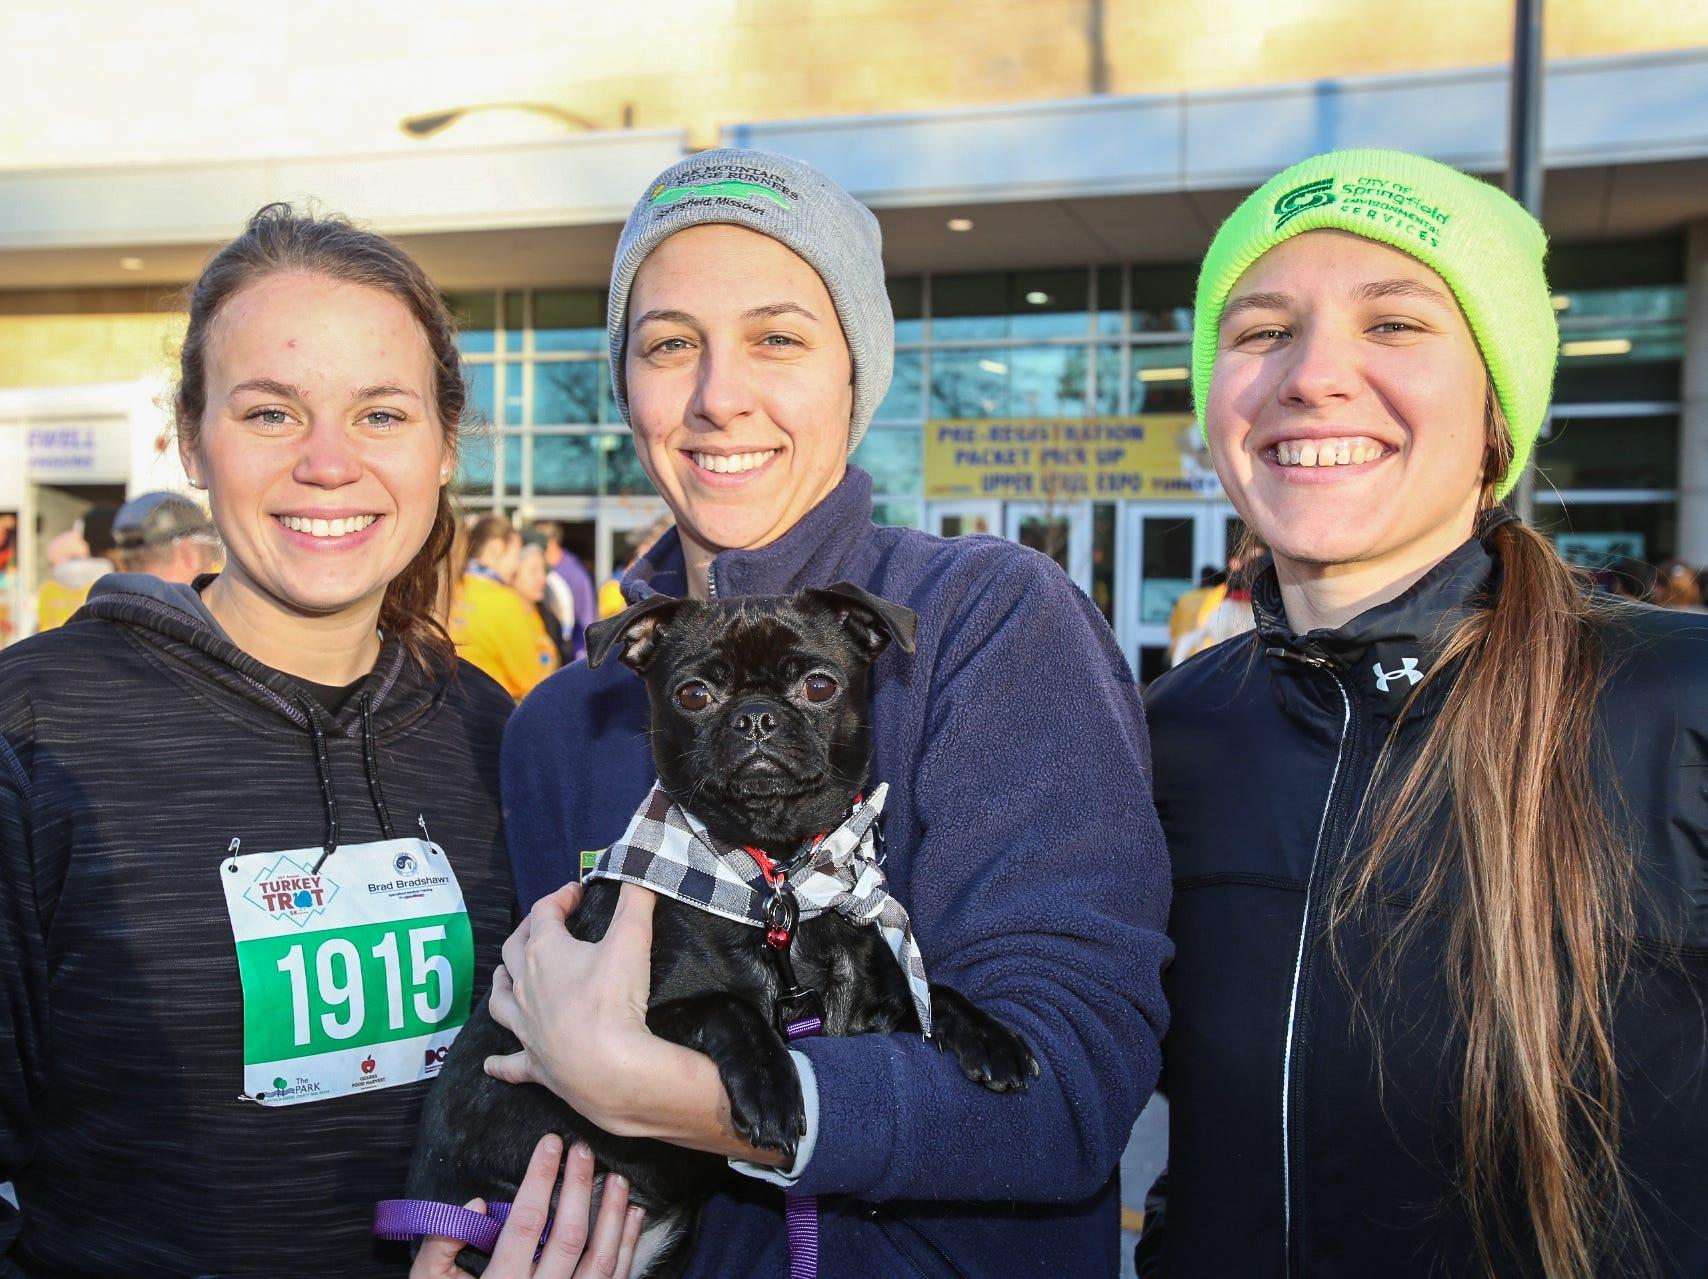 Allie Warmack, Chiara Citterio, Boom Boom, and Clarissa Hatley